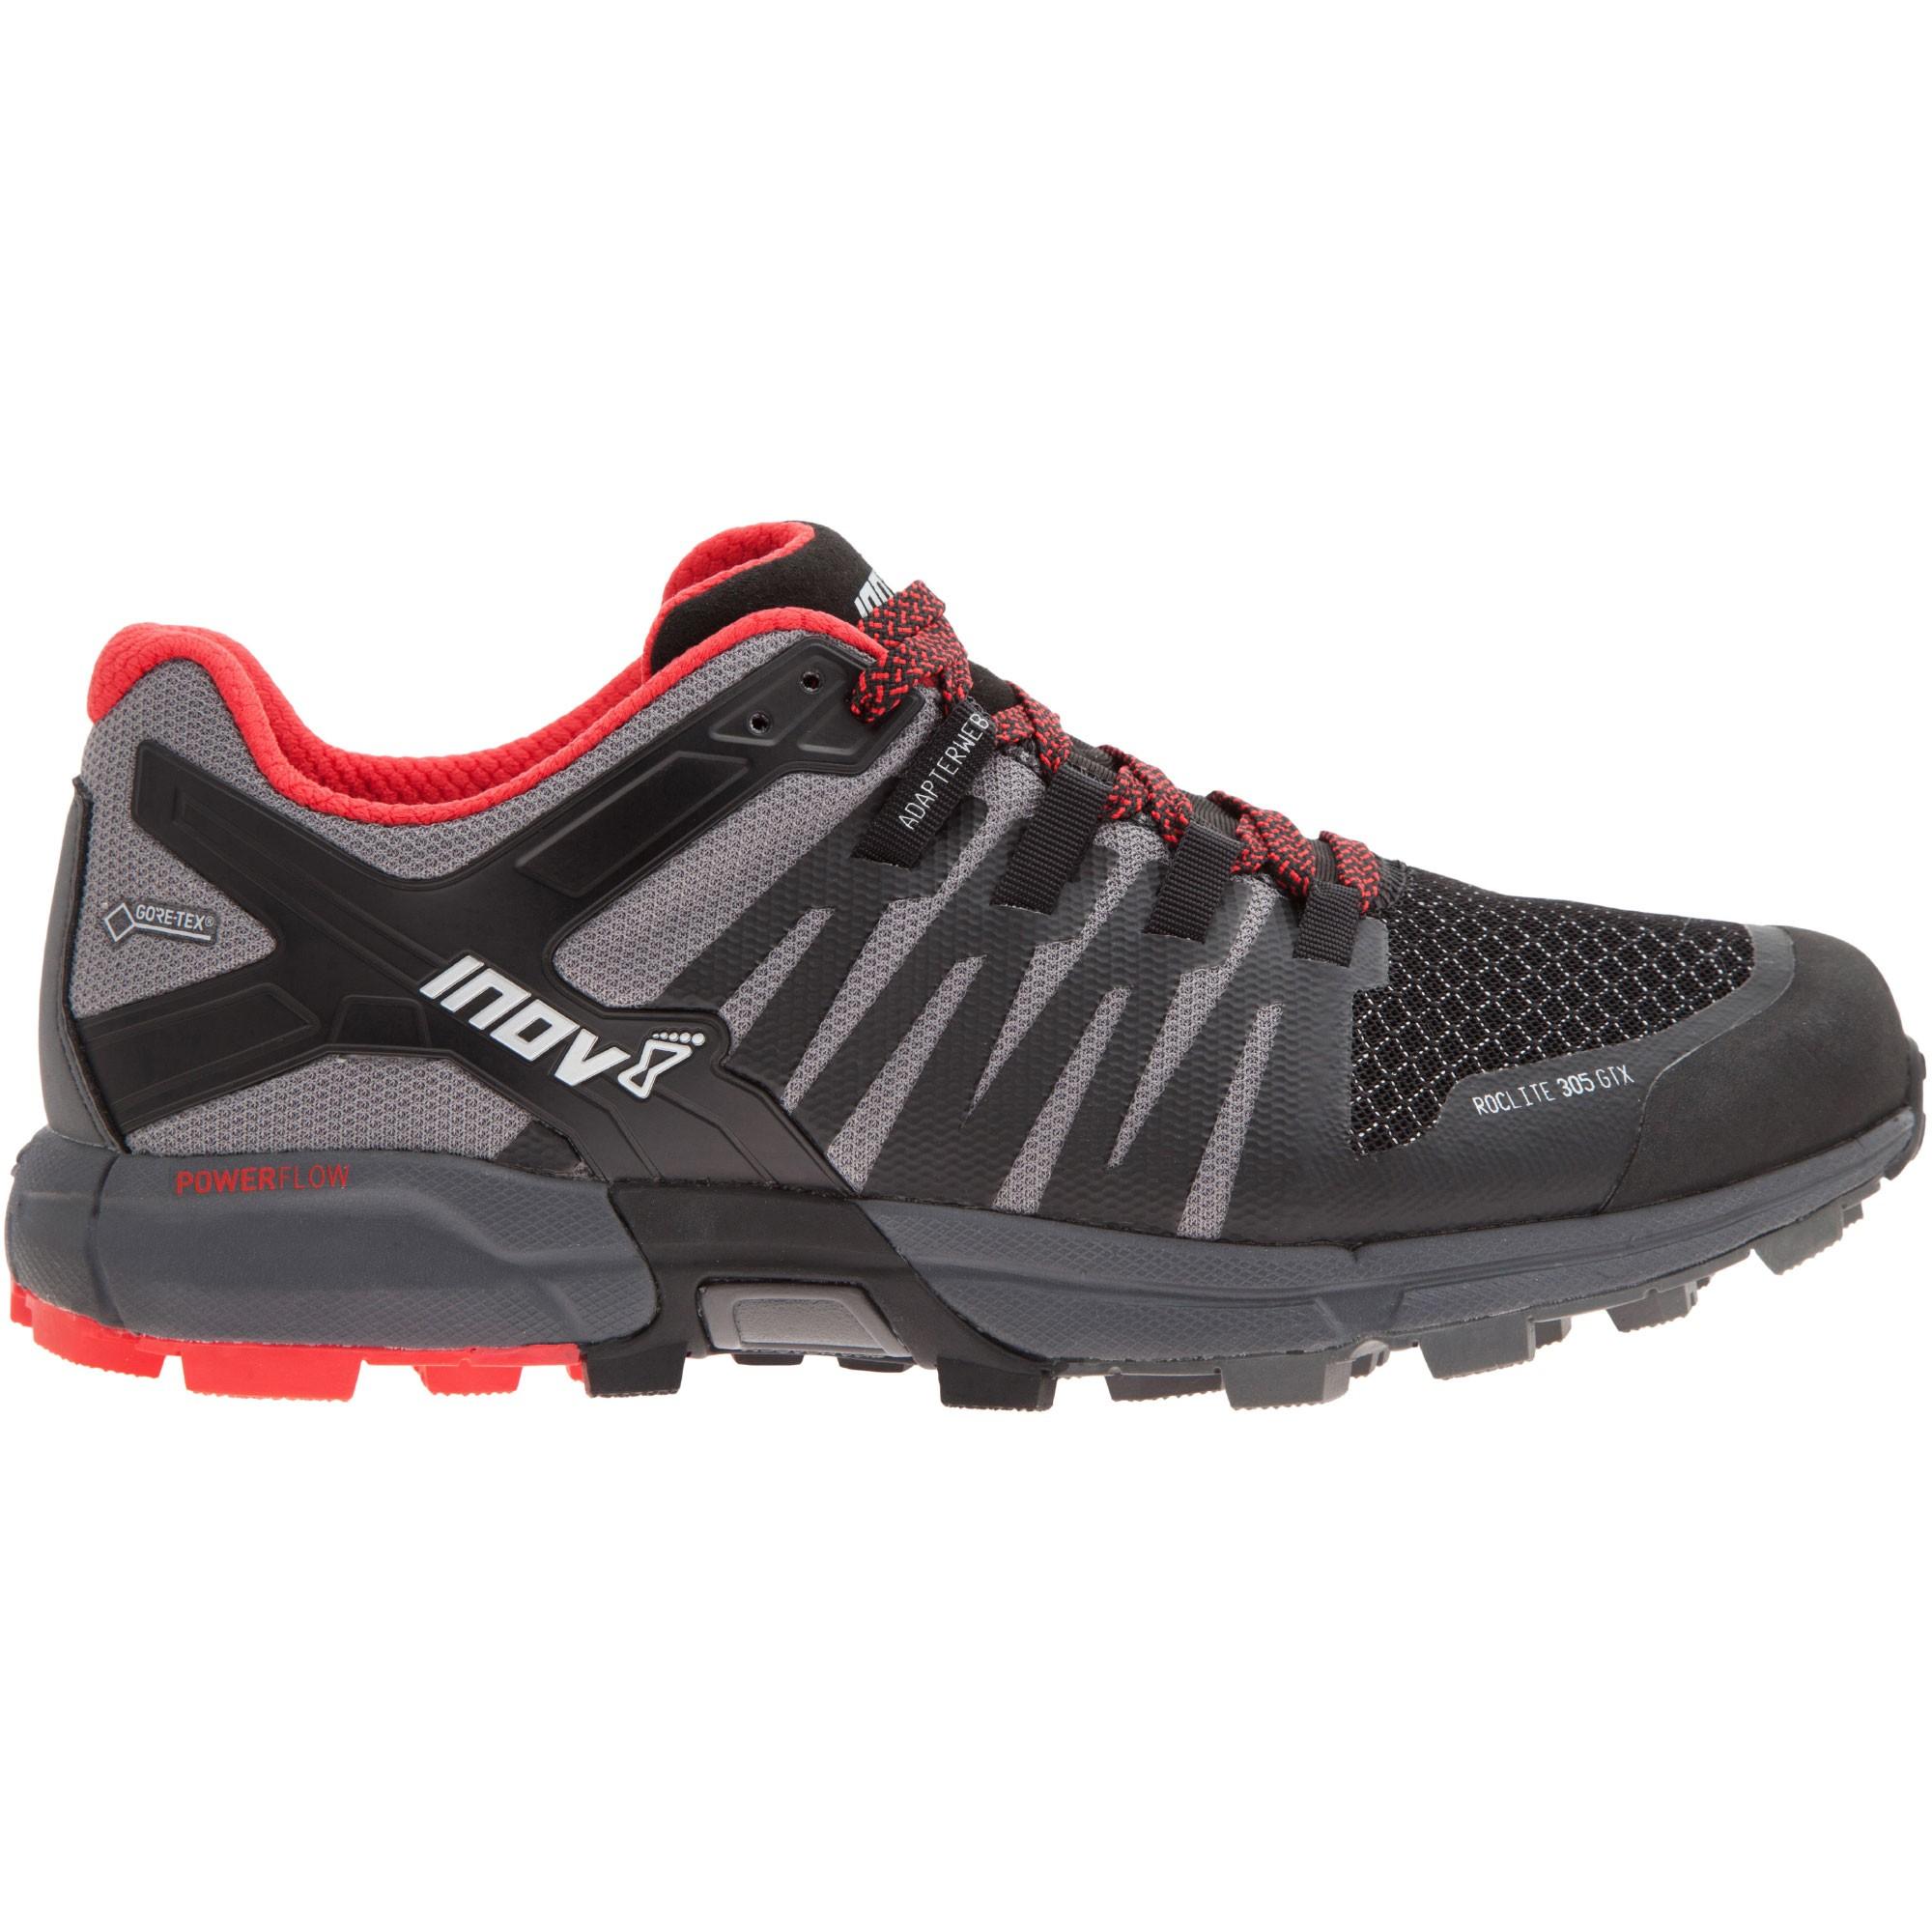 INOV8 - Roclite 305 GTX Trail Running Shoes